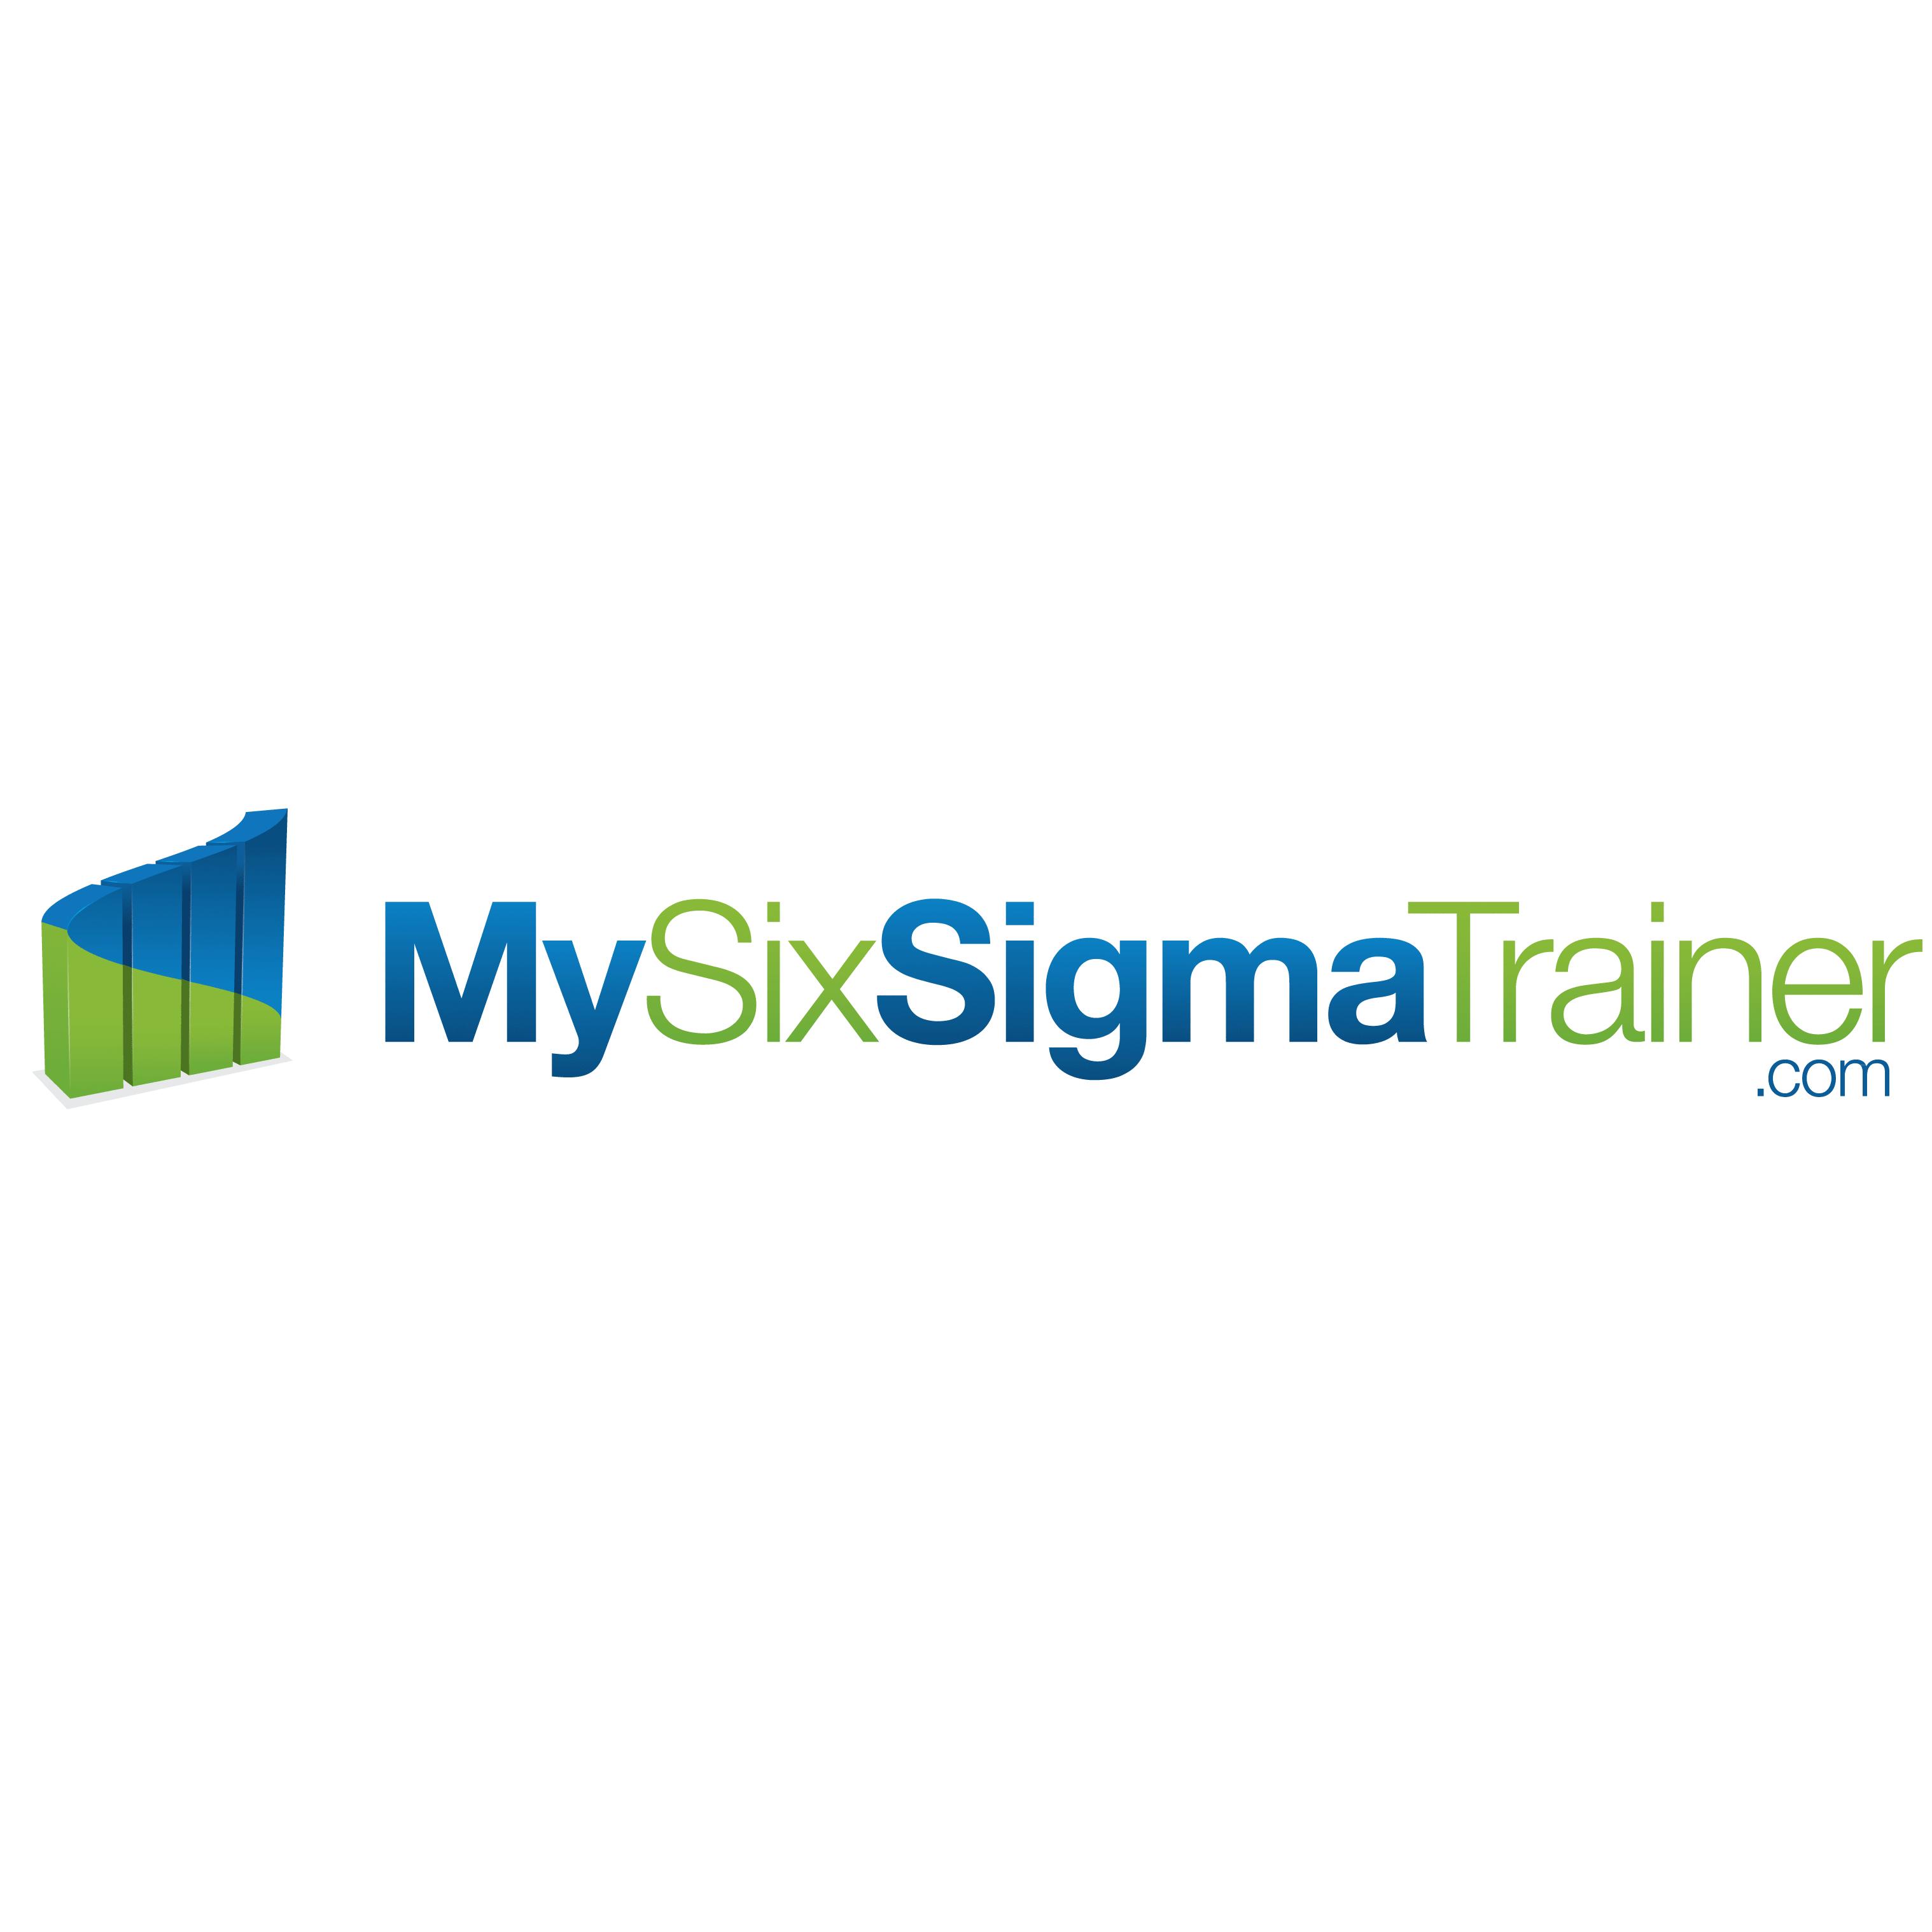 Mysixsigmatrainer